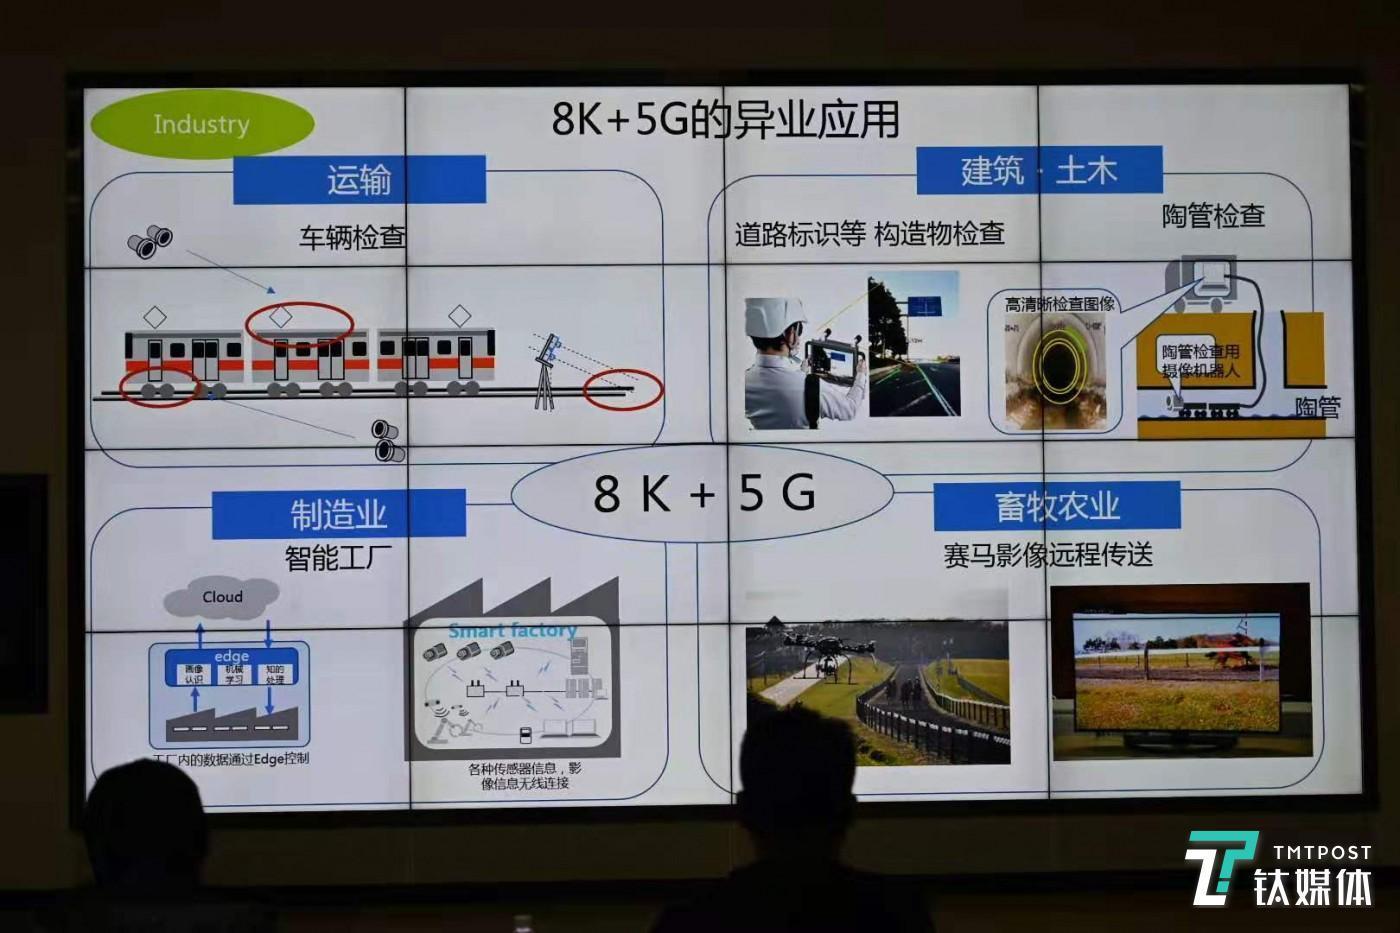 5G 8K多产业应用